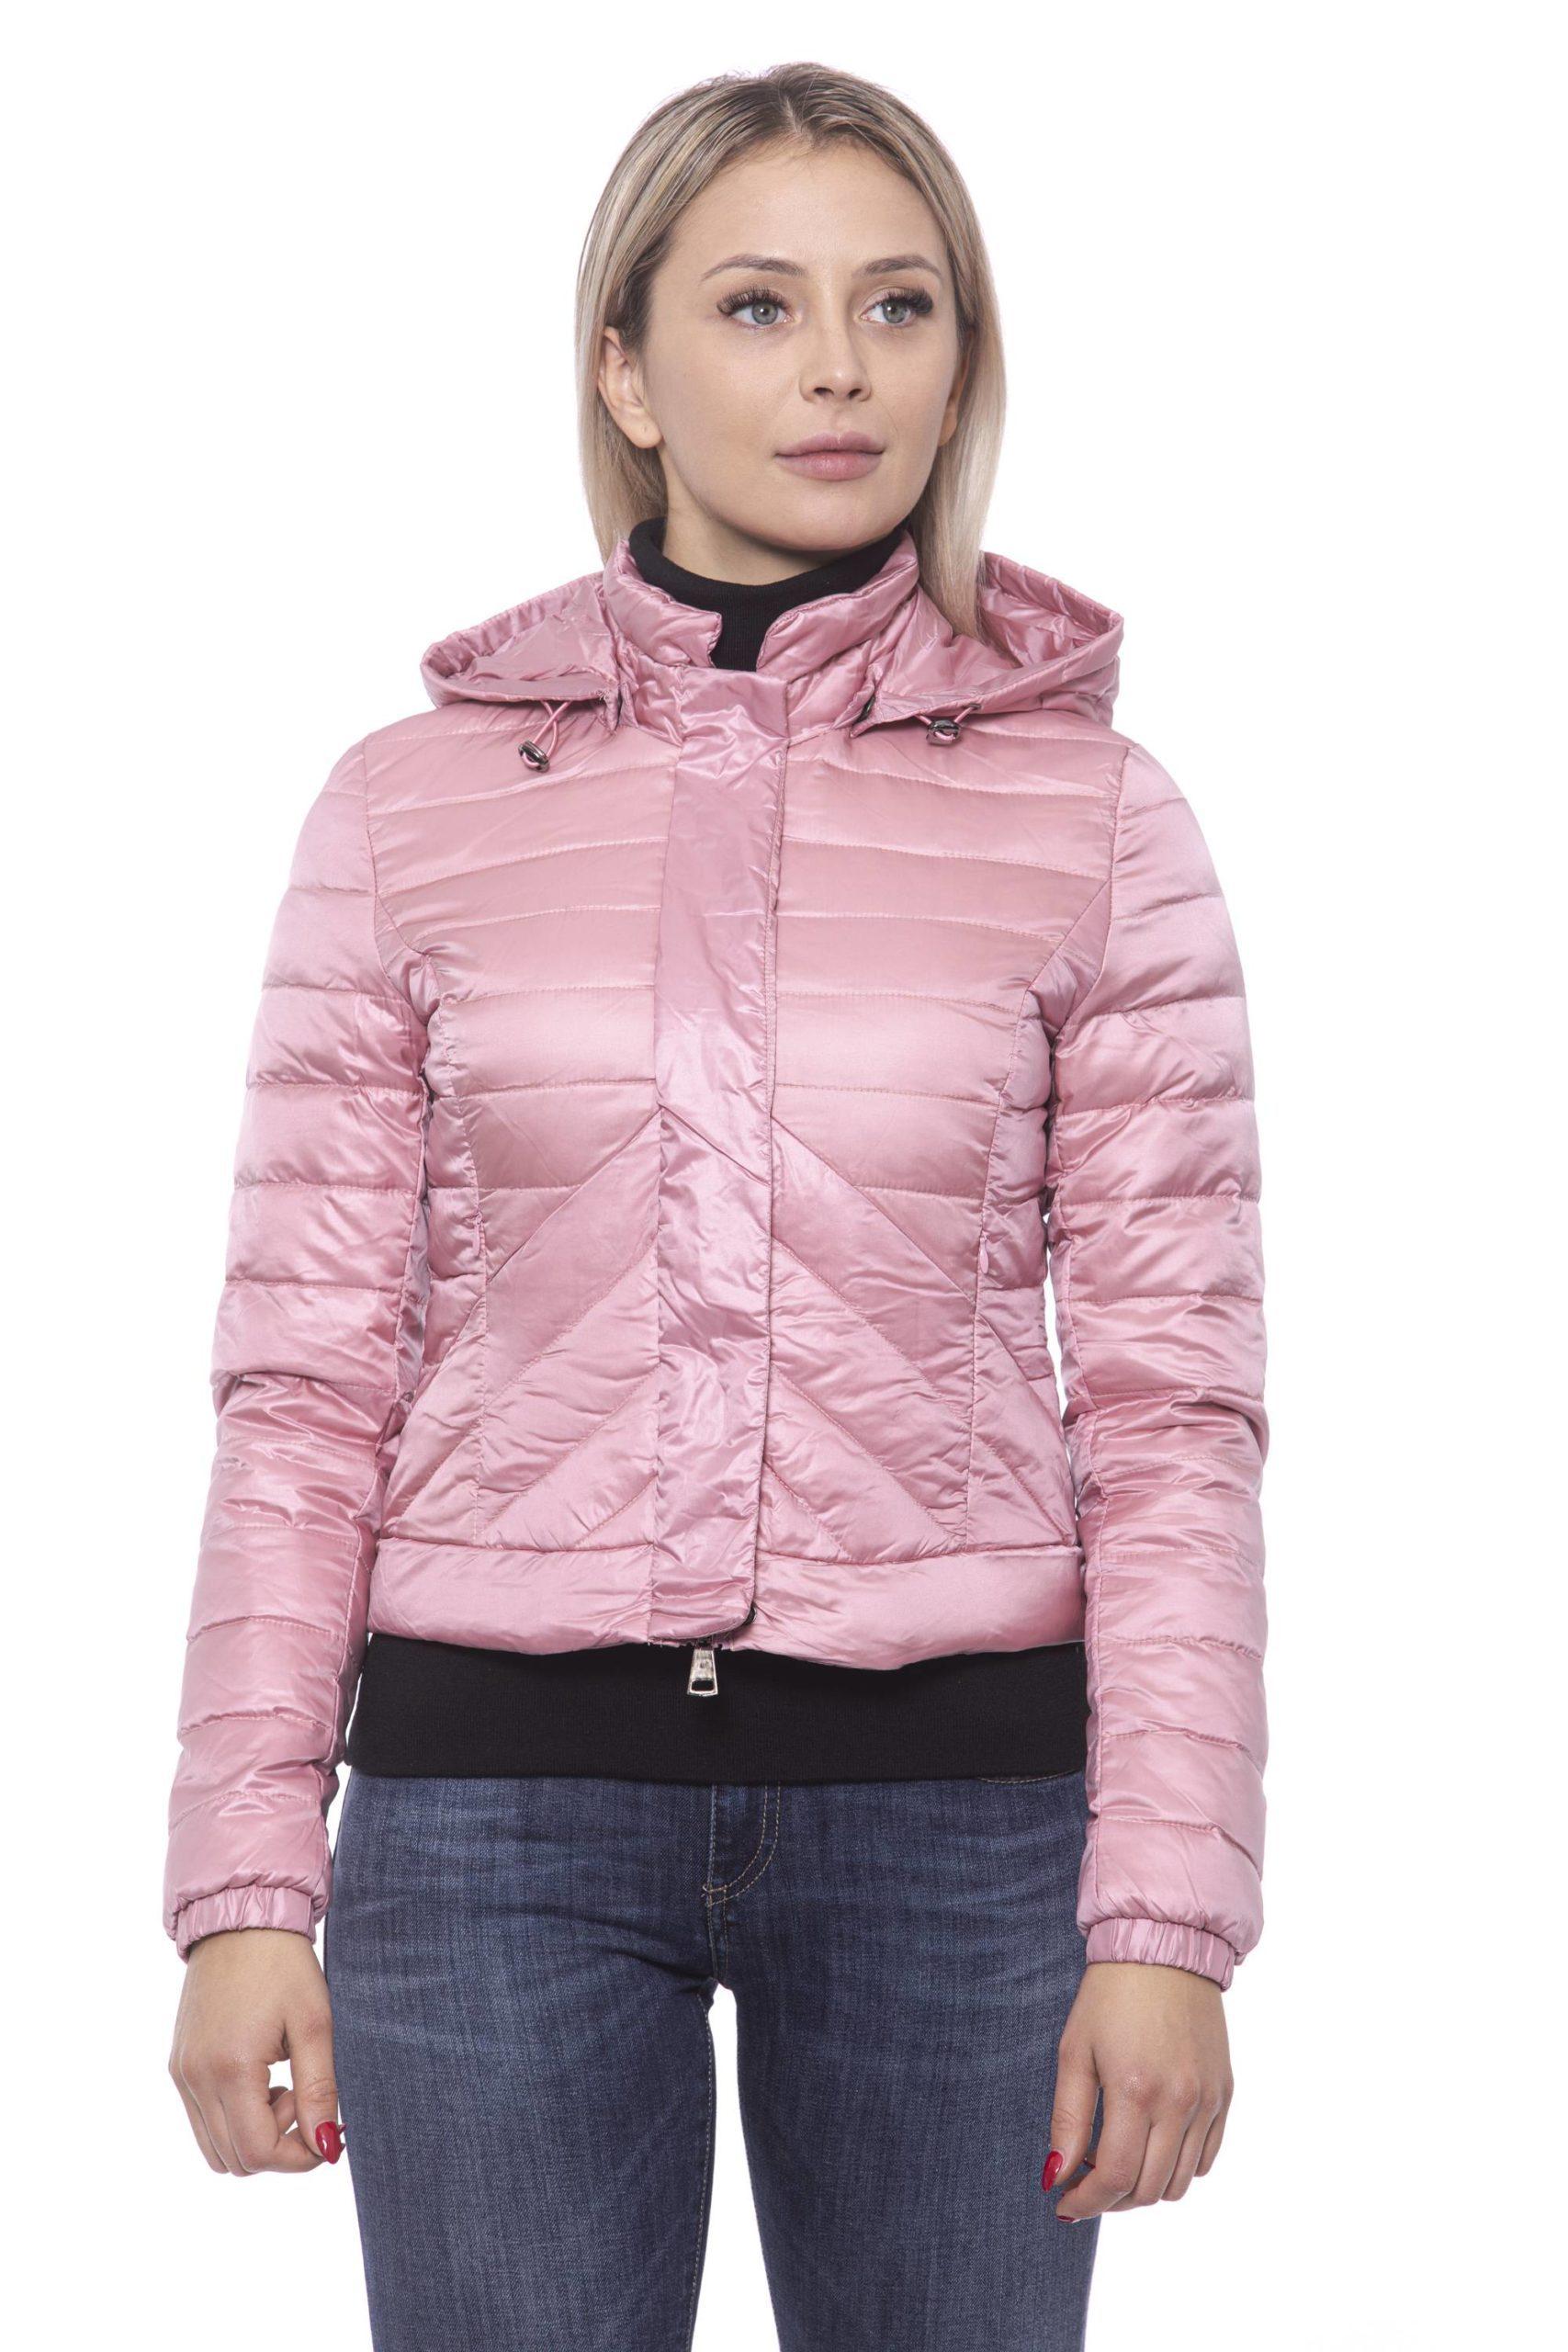 19V69 Italia Women's Rosa Jacket Pink 191388291 - M